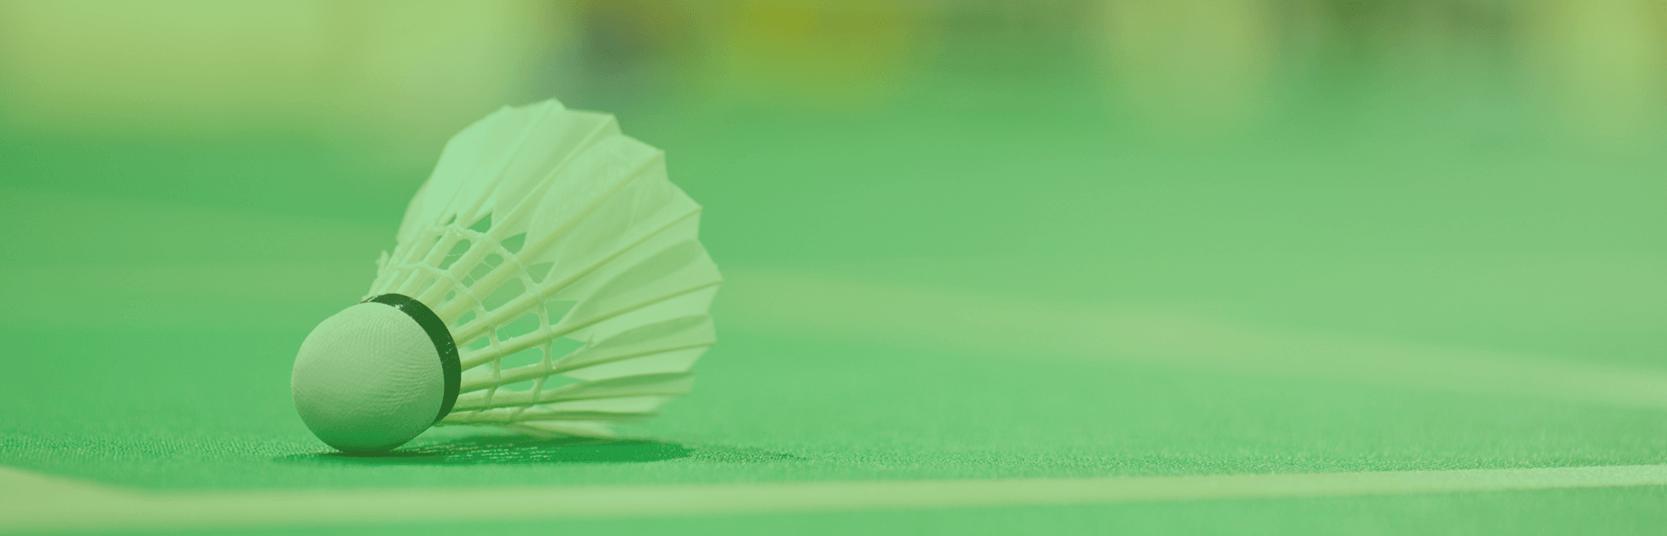 Heva le logiciel de gestion de federation de sport du groupe StadLine - Fond